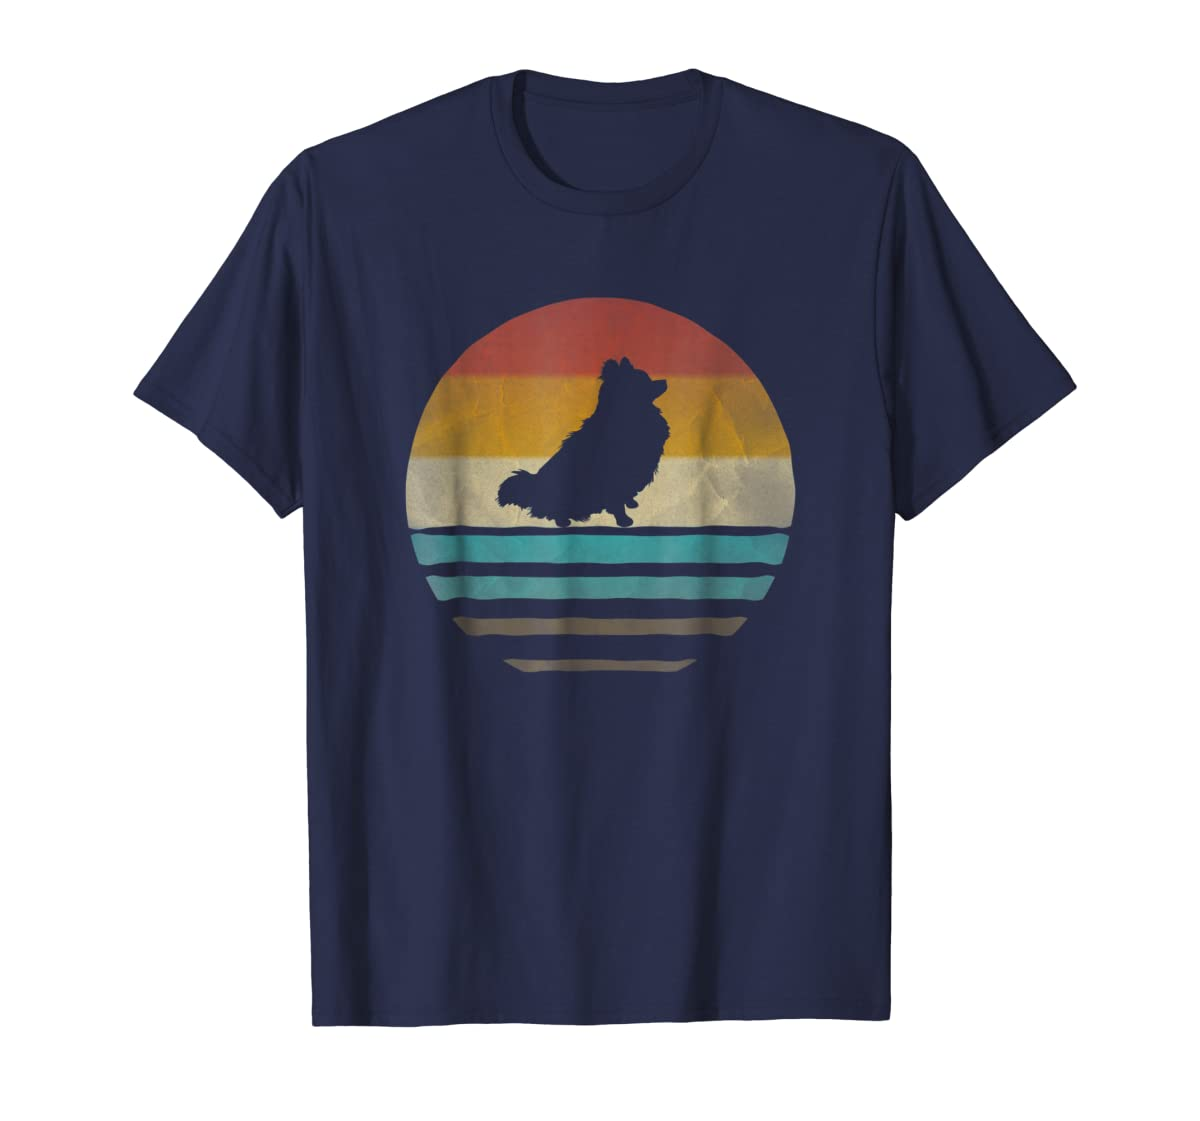 Pomeranian Dog Shirt Retro Vintage 70s Silhouette Distressed-Men's T-Shirt-Navy